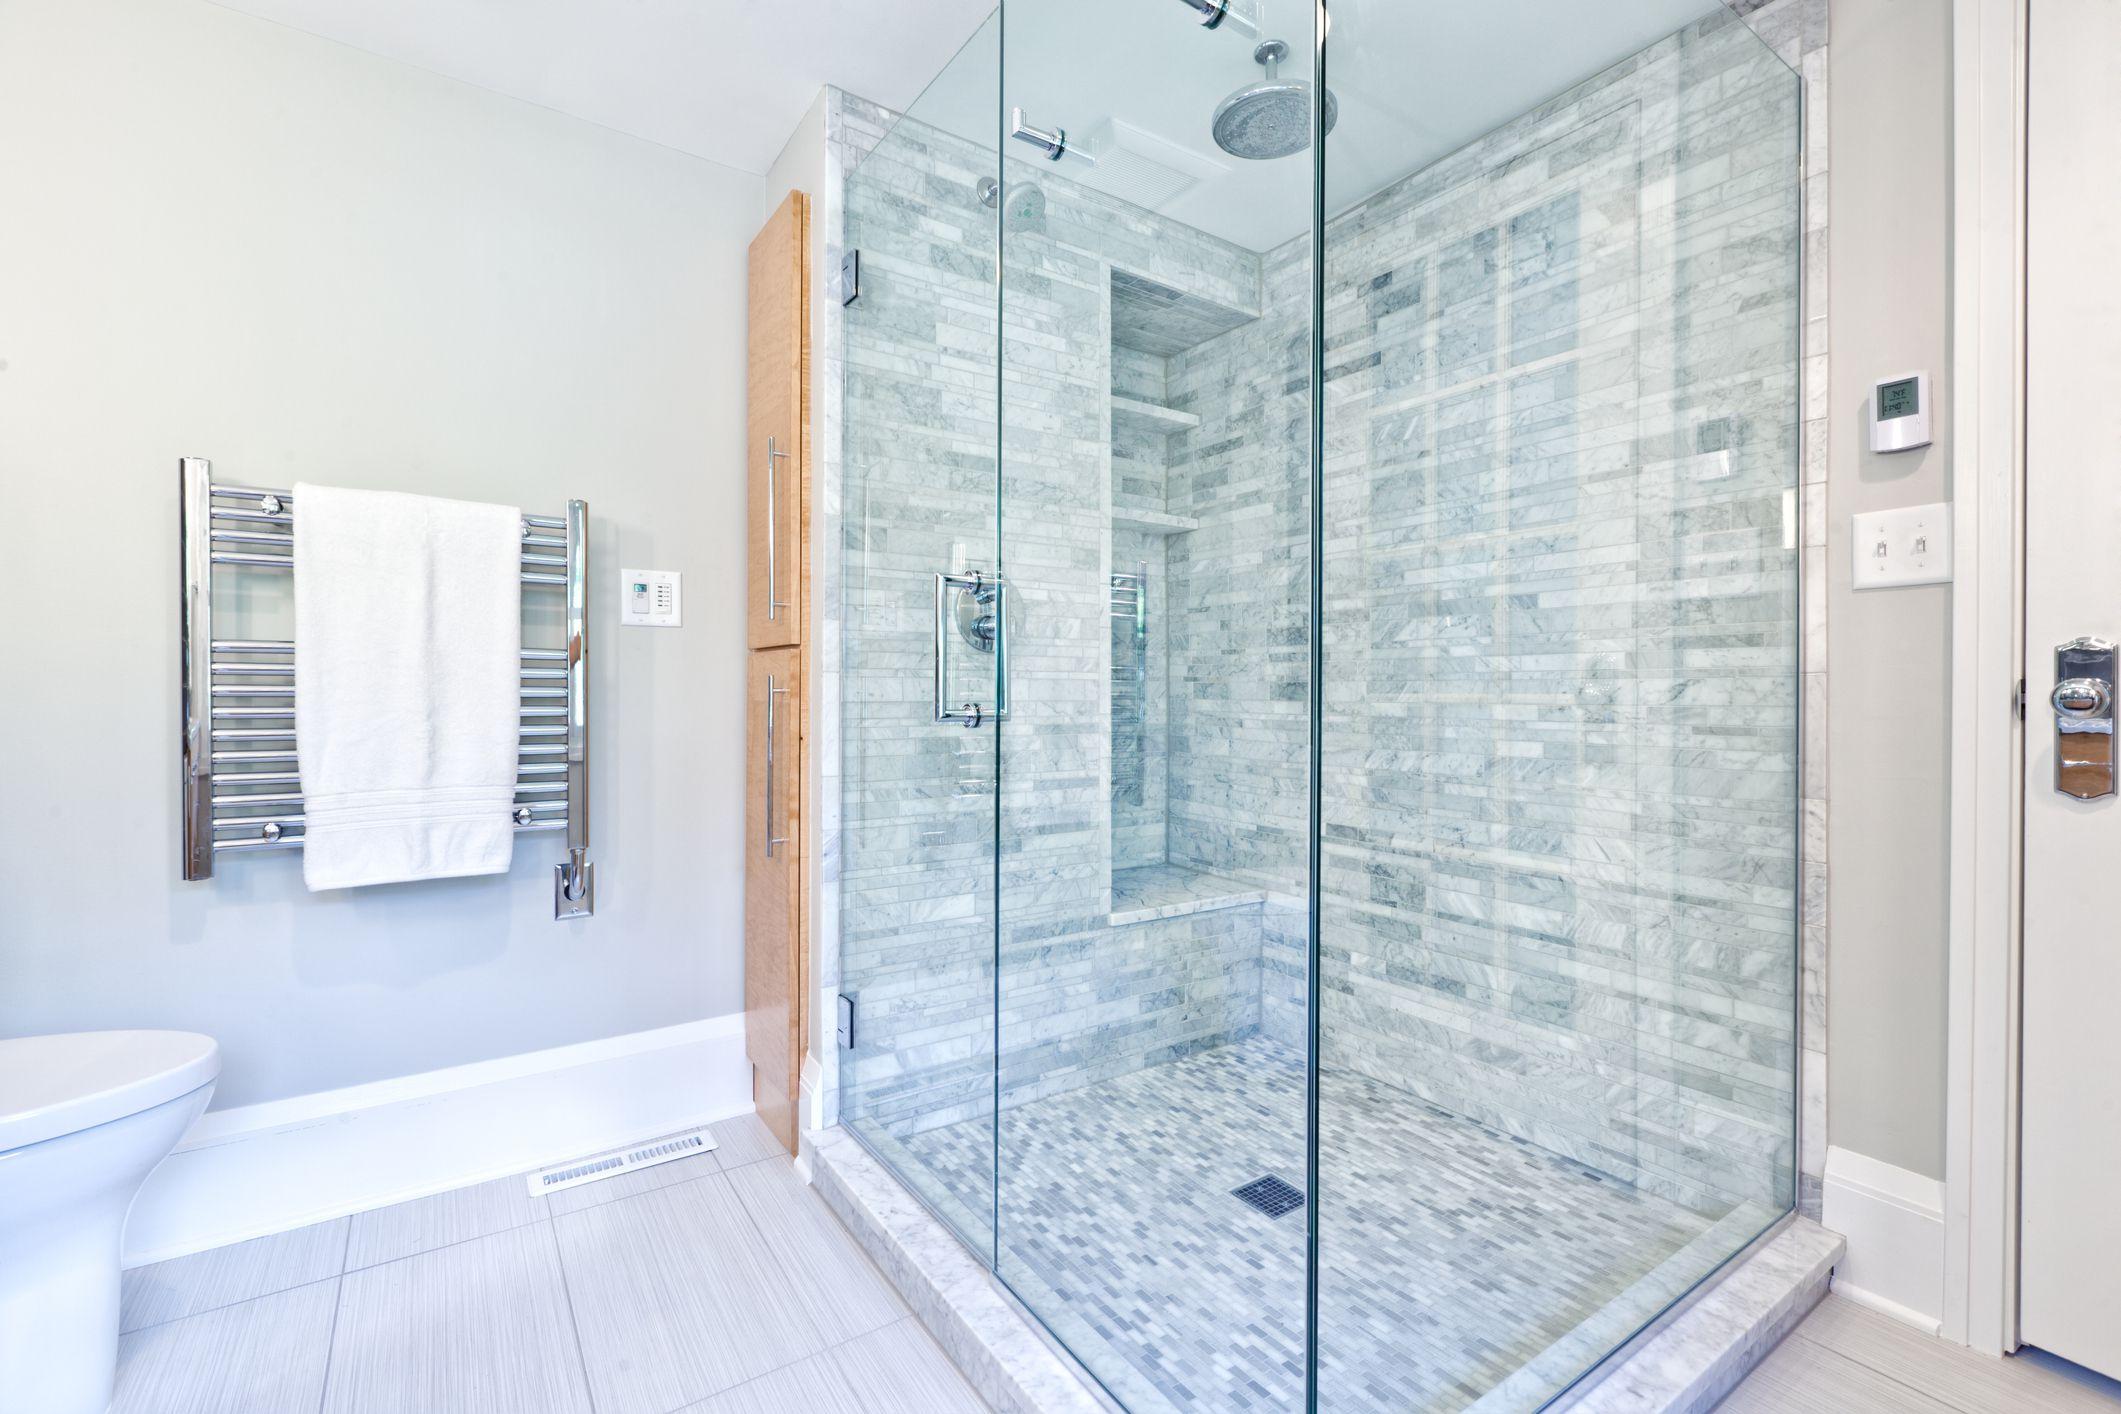 The Original Frameless Shower Doors Is Now Offering Free Estimates In Hialeah, FL